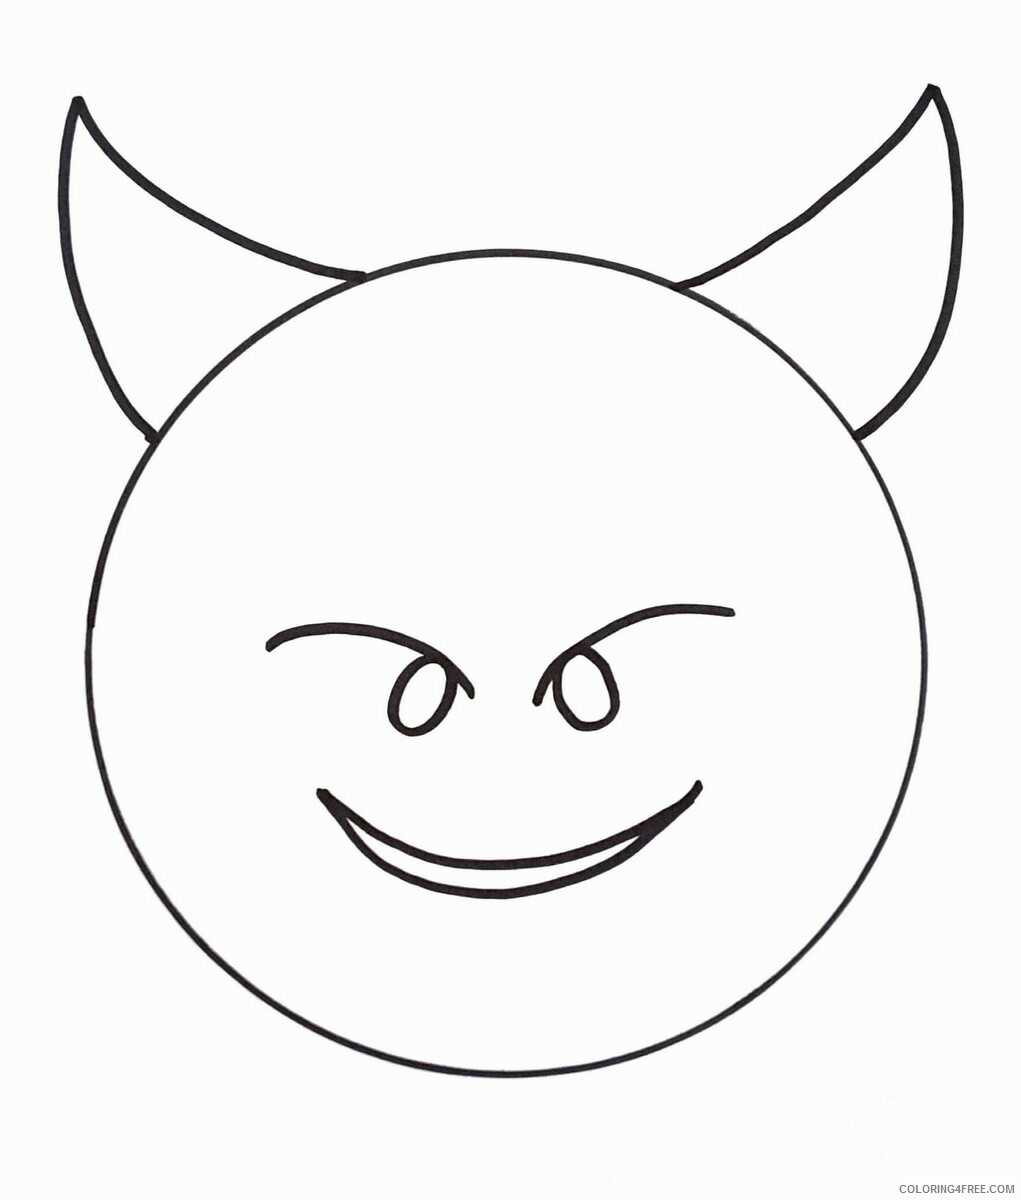 Emoji Coloring Pages emoji19 Printable 2021 2162 Coloring4free